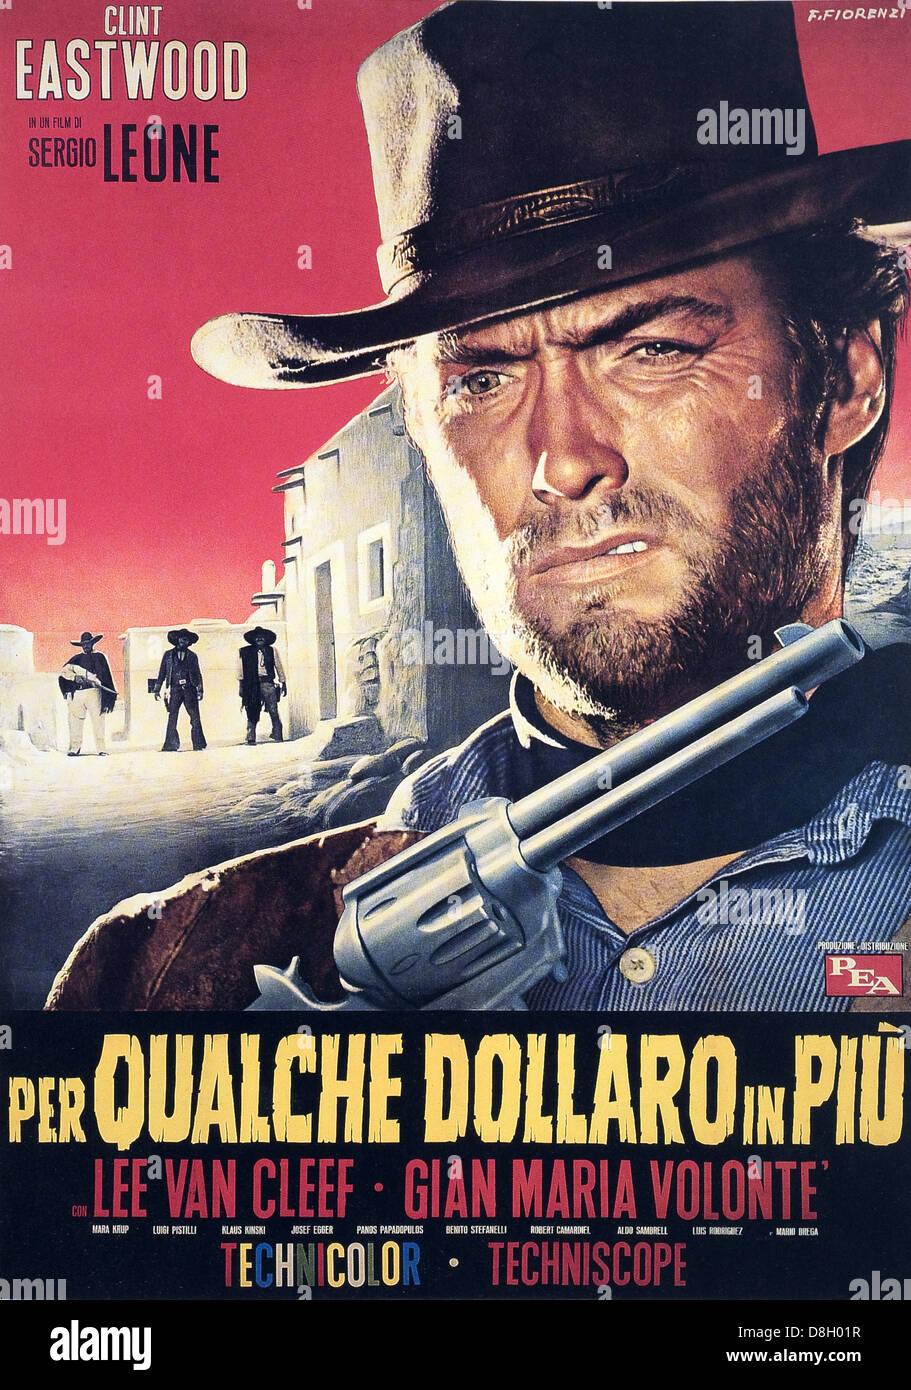 Per Qualche Dollaro in piu Original Italian Movie Poster Clint Eastwood; Sergio Leone - Stock Image